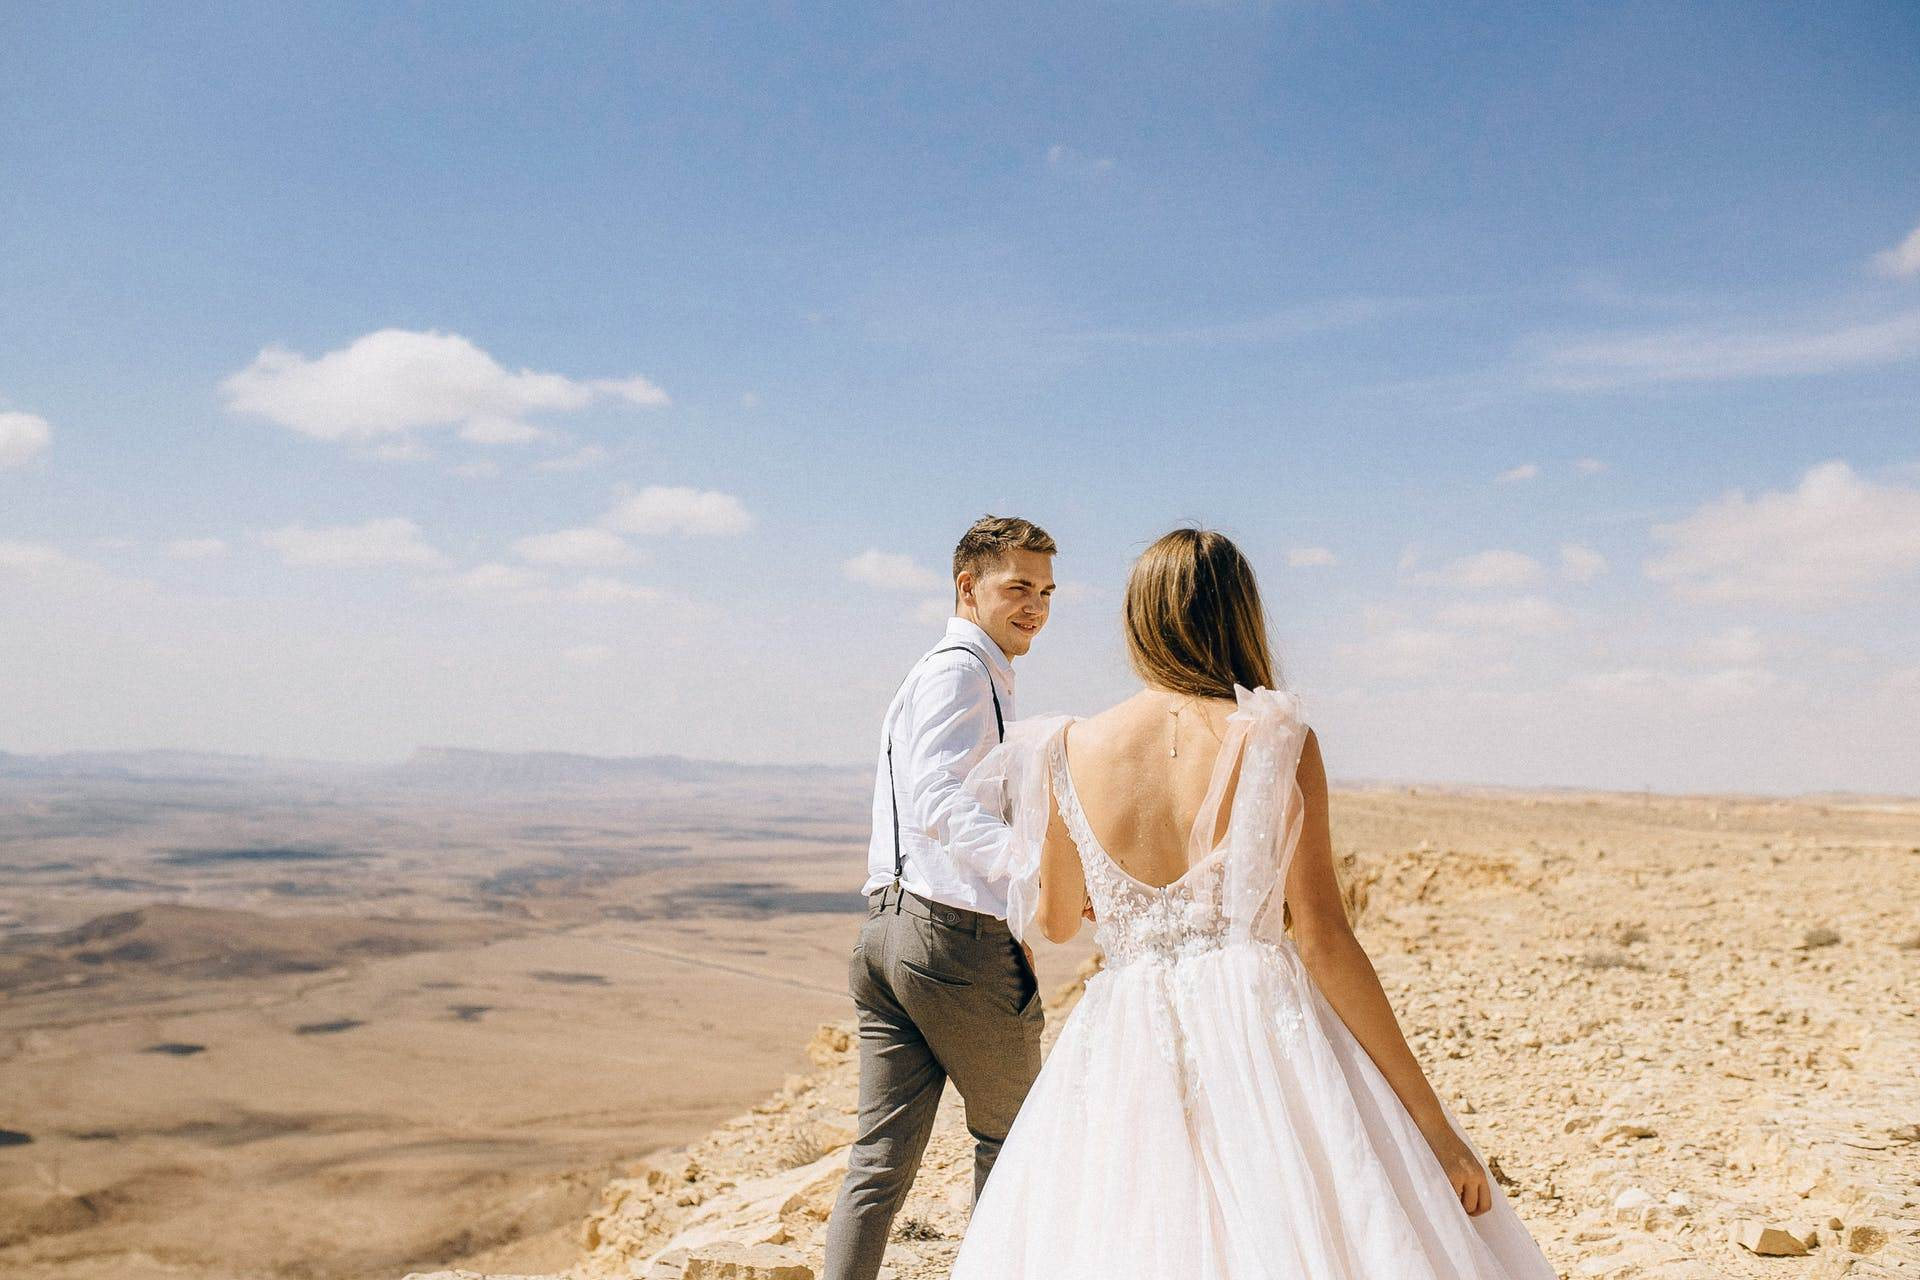 Wedding-Dresses-2761